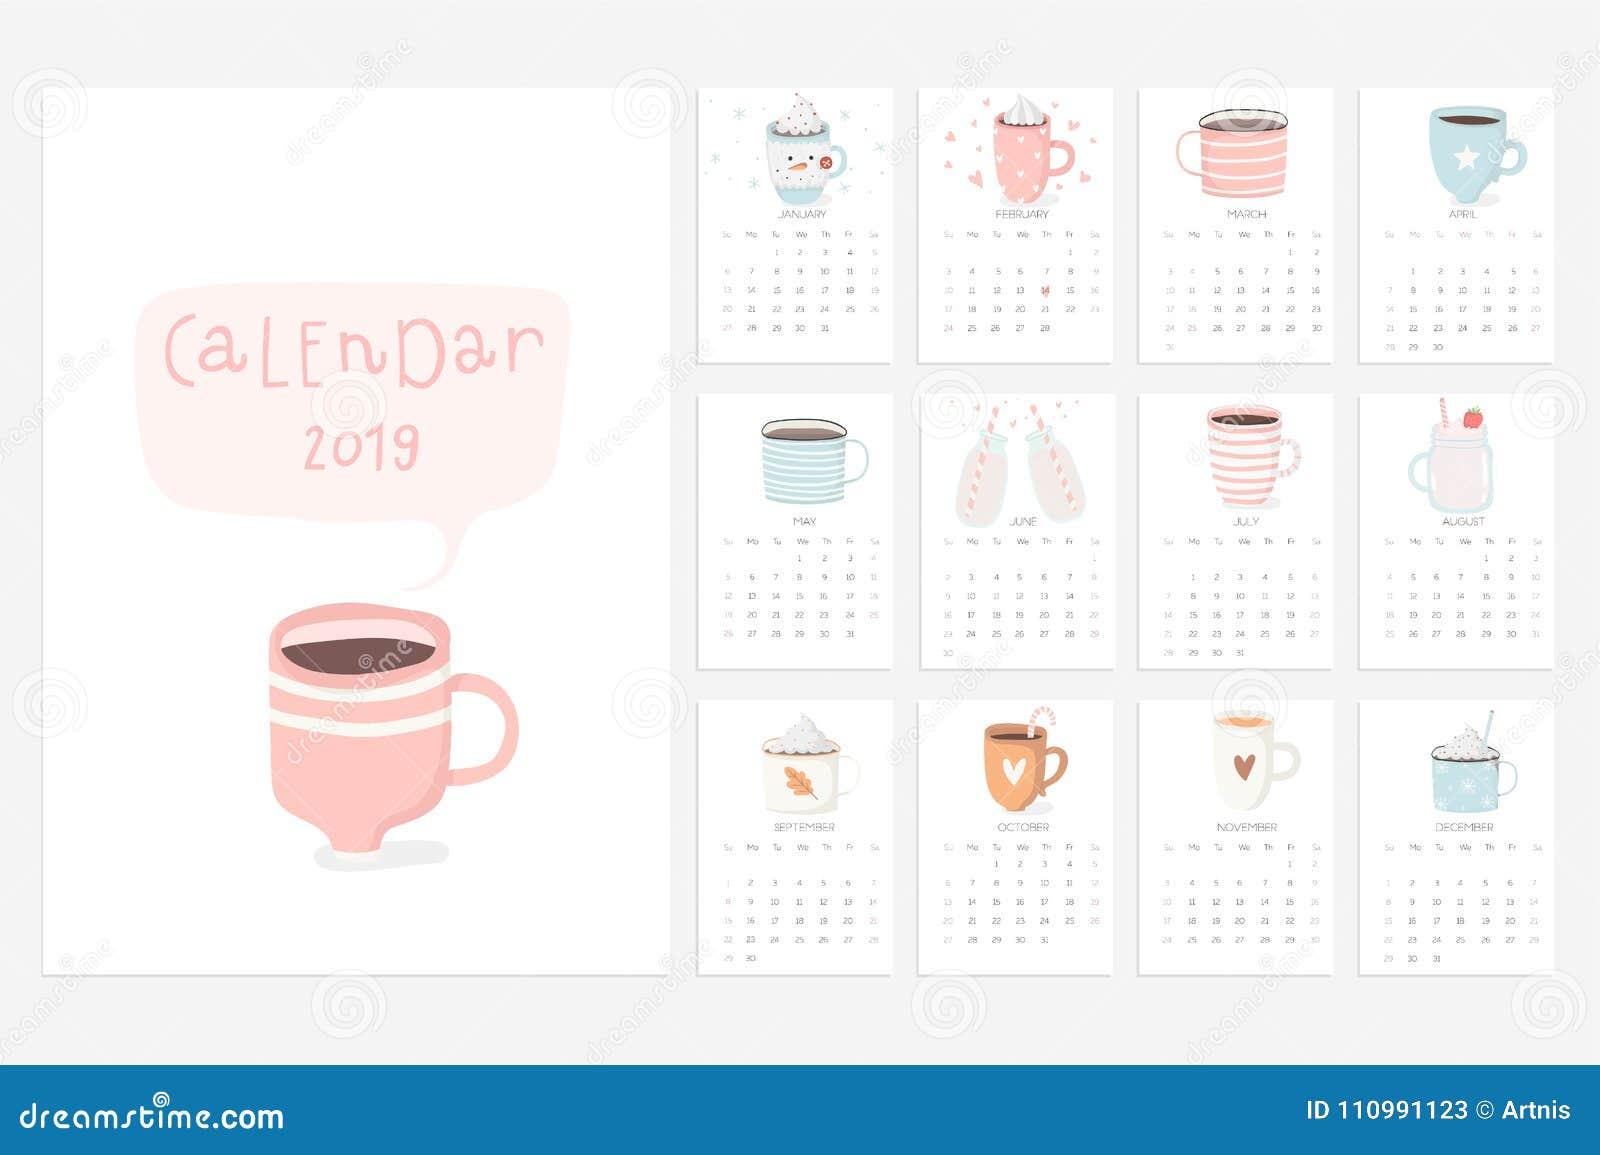 Fun Calendars 2019 Calendar 2019. Fun And Cute Calendar With Cute Hand Drawn Cups